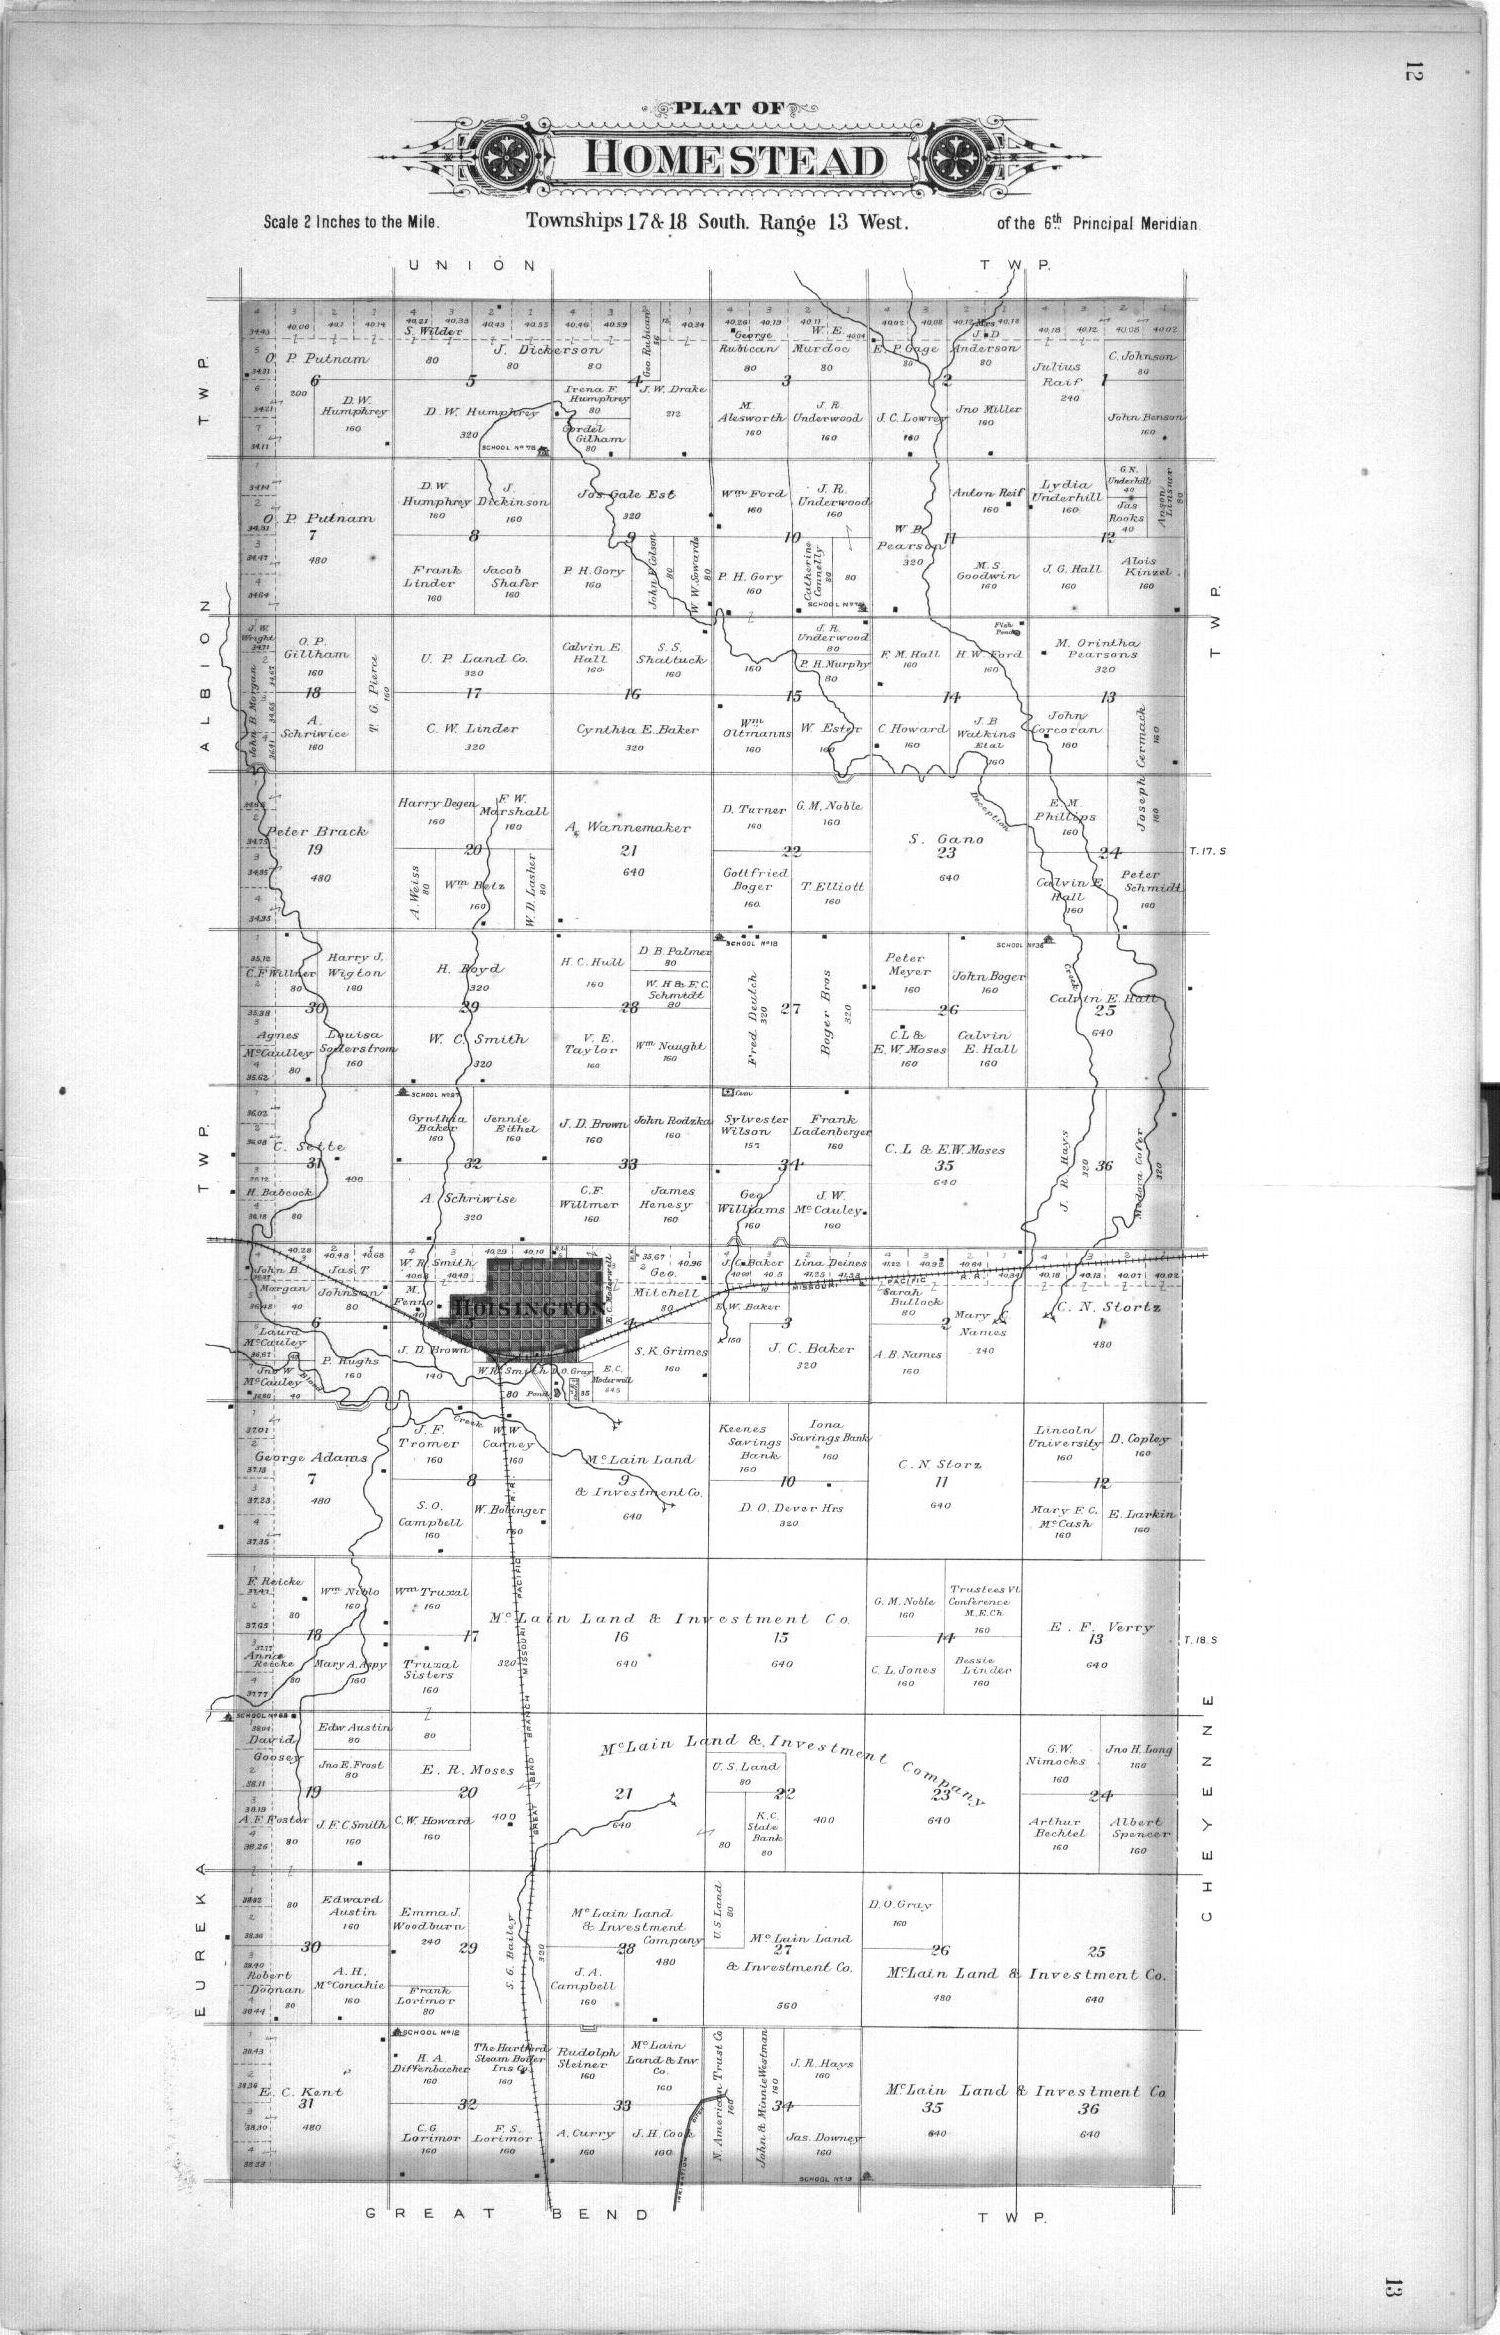 Plat book, Barton County, Kansas - 12 & 13